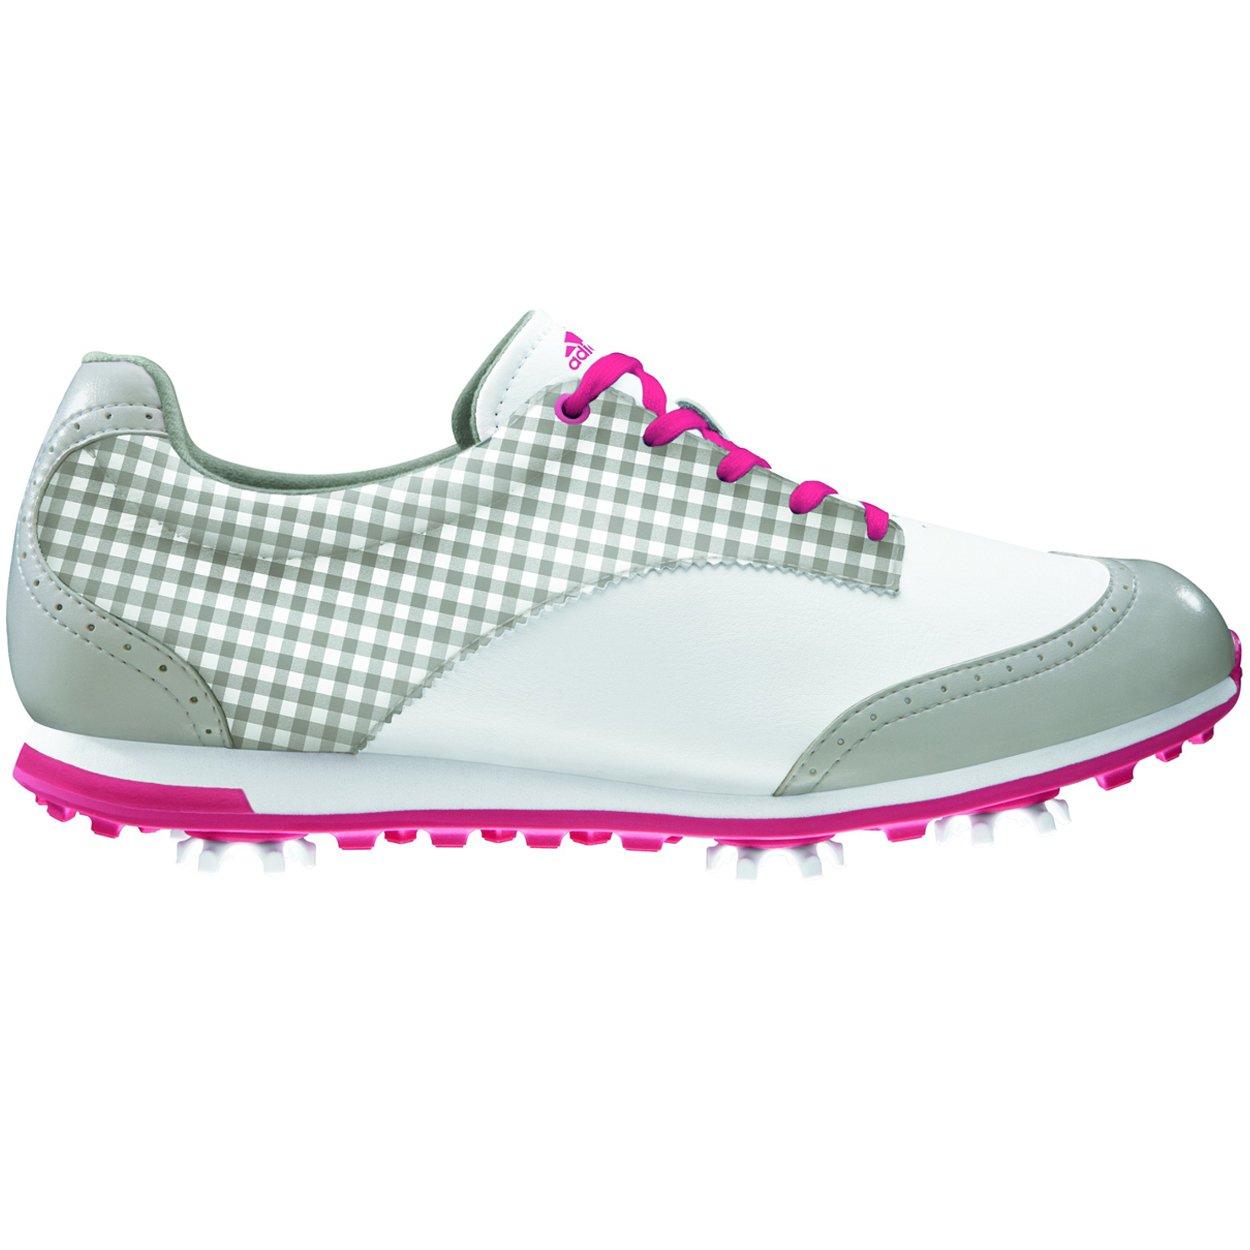 adidas Women's Driver Grace Golf Shoe,Running White/Chrome/Punch,9.5 M US